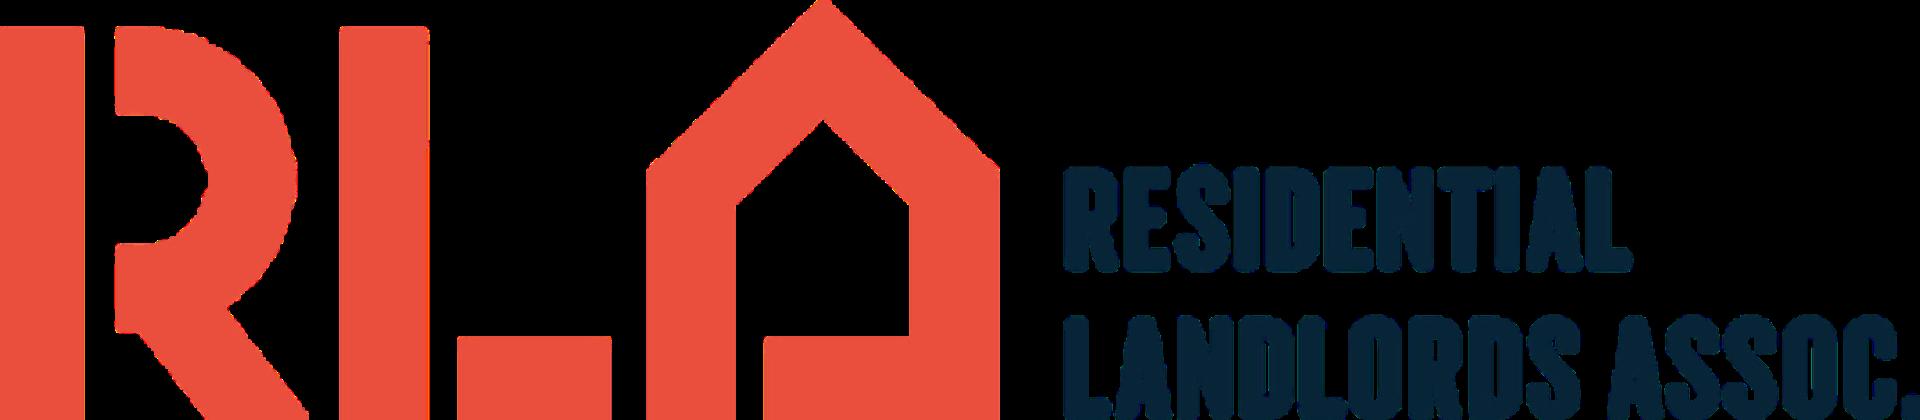 rla-logo-sm.png